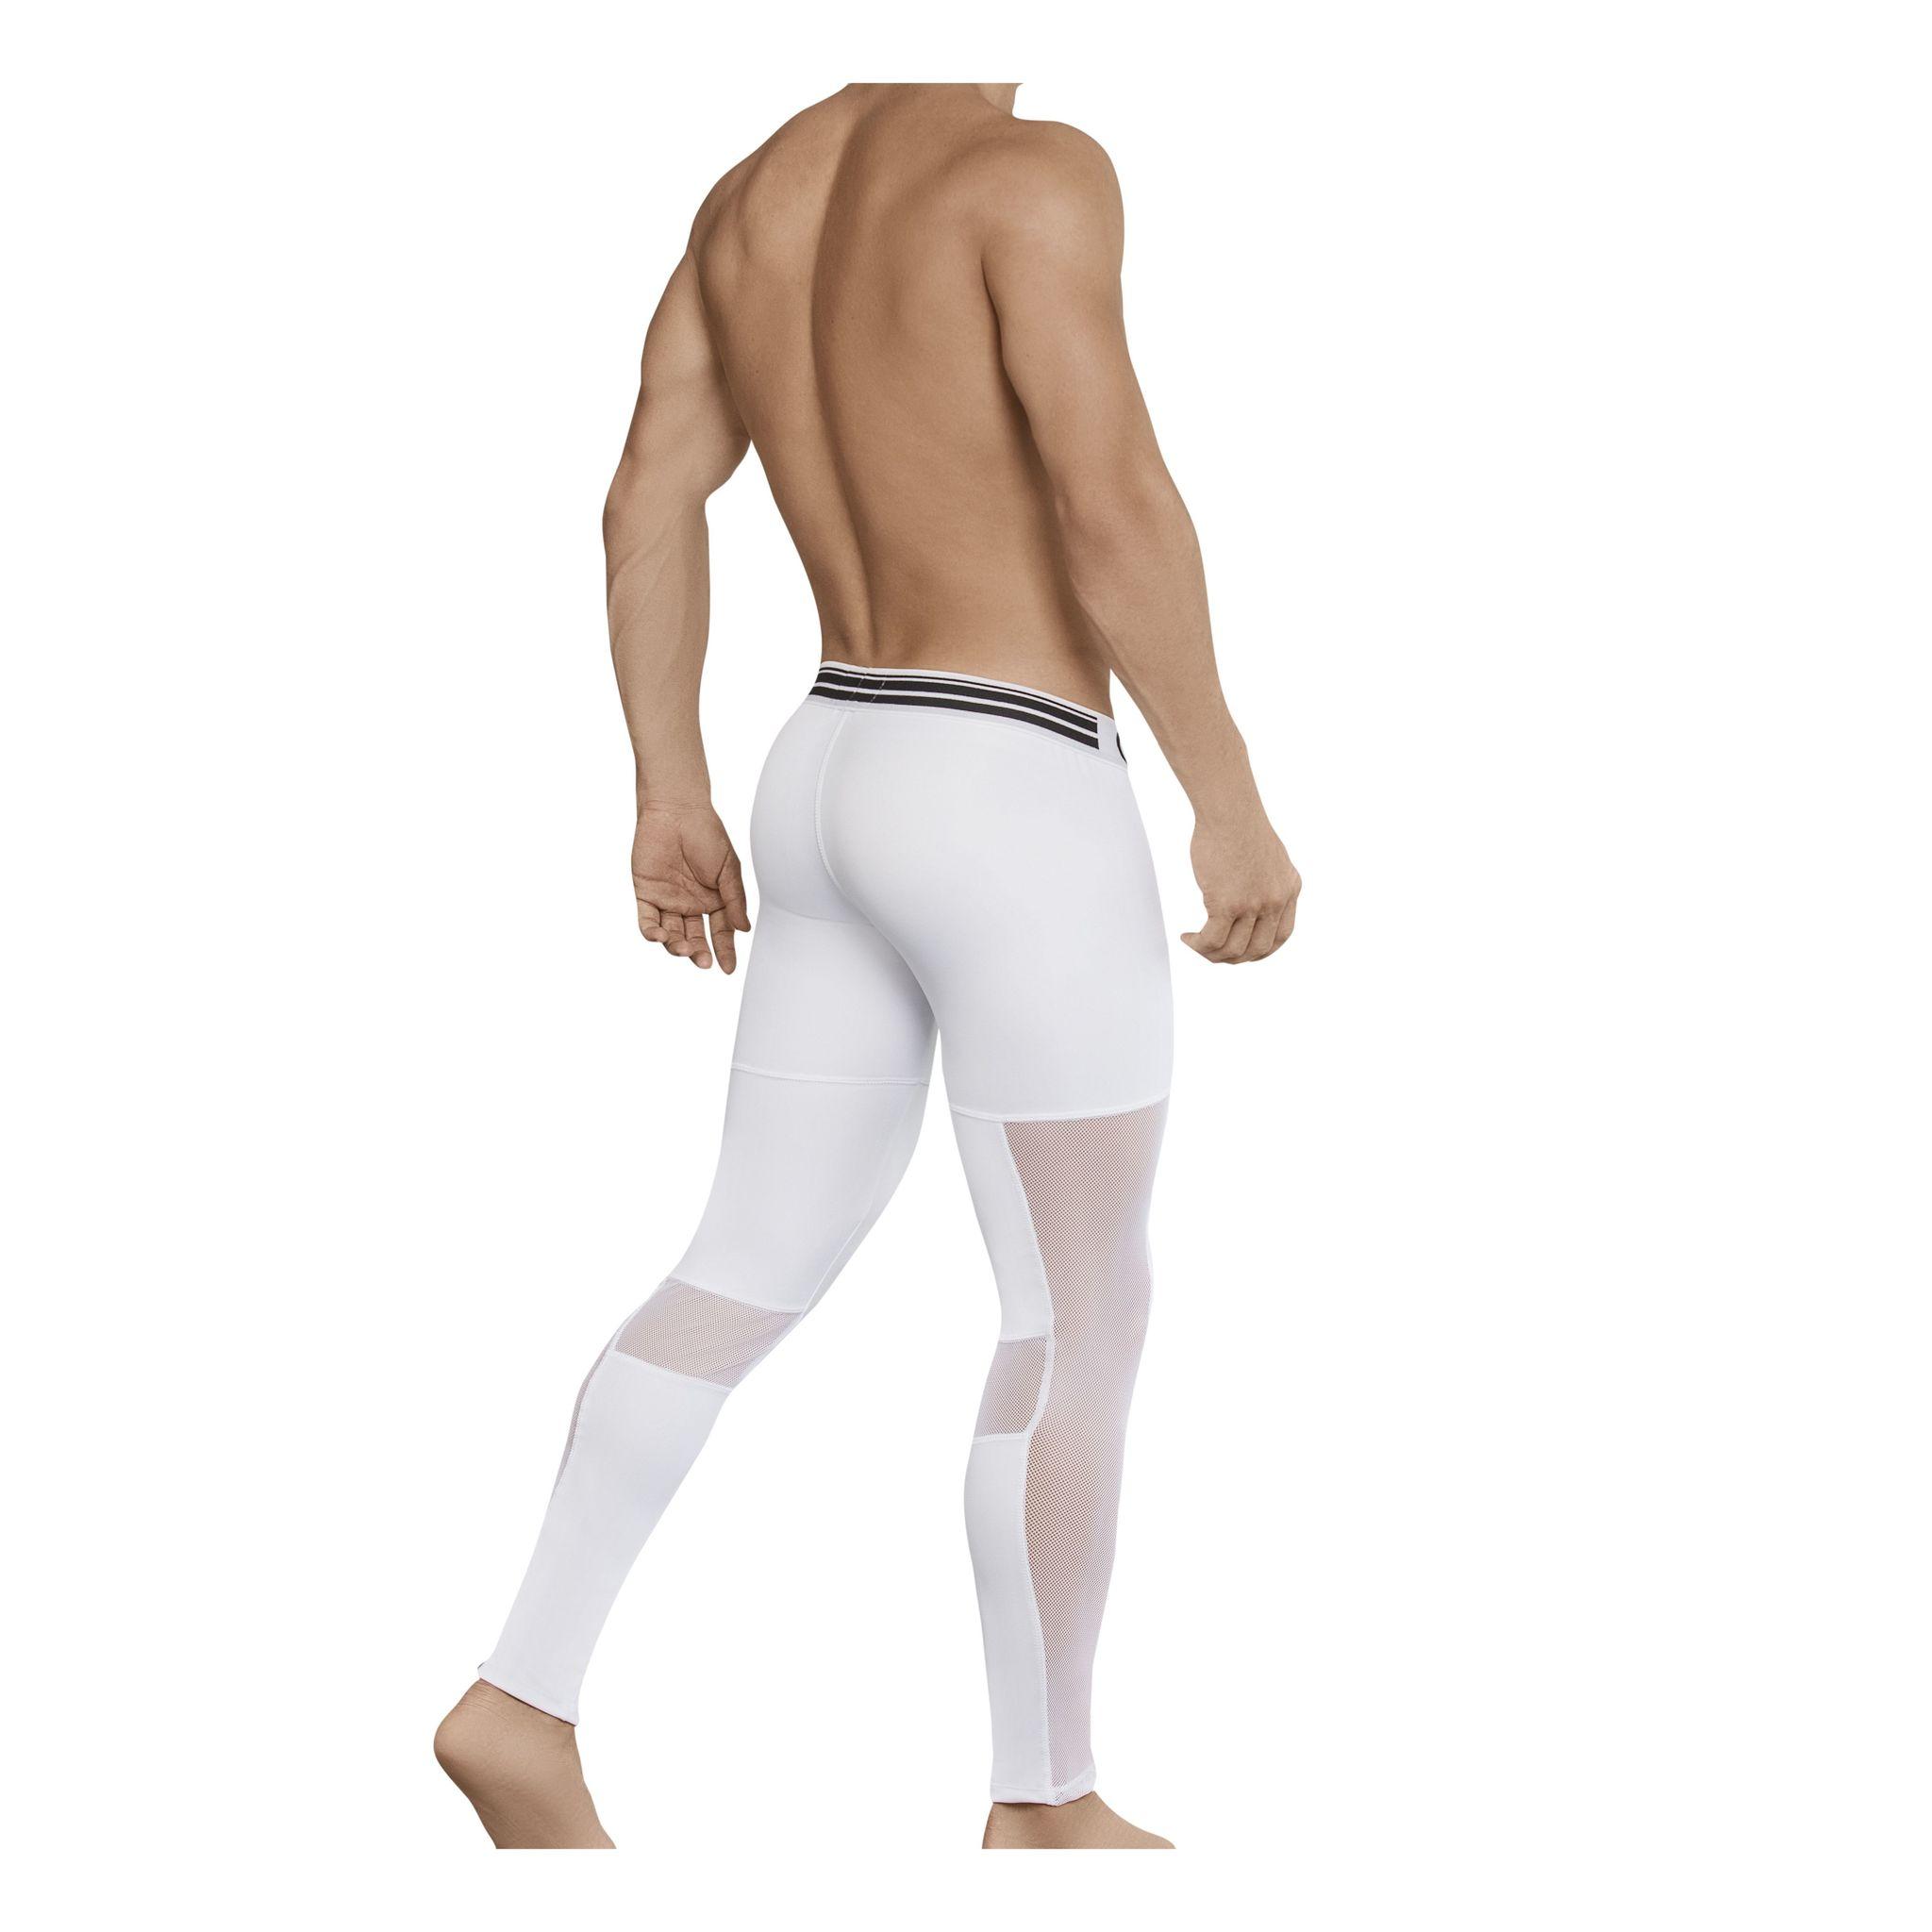 Мужские кальсоны белые Clever Colossal Long Pant 031301